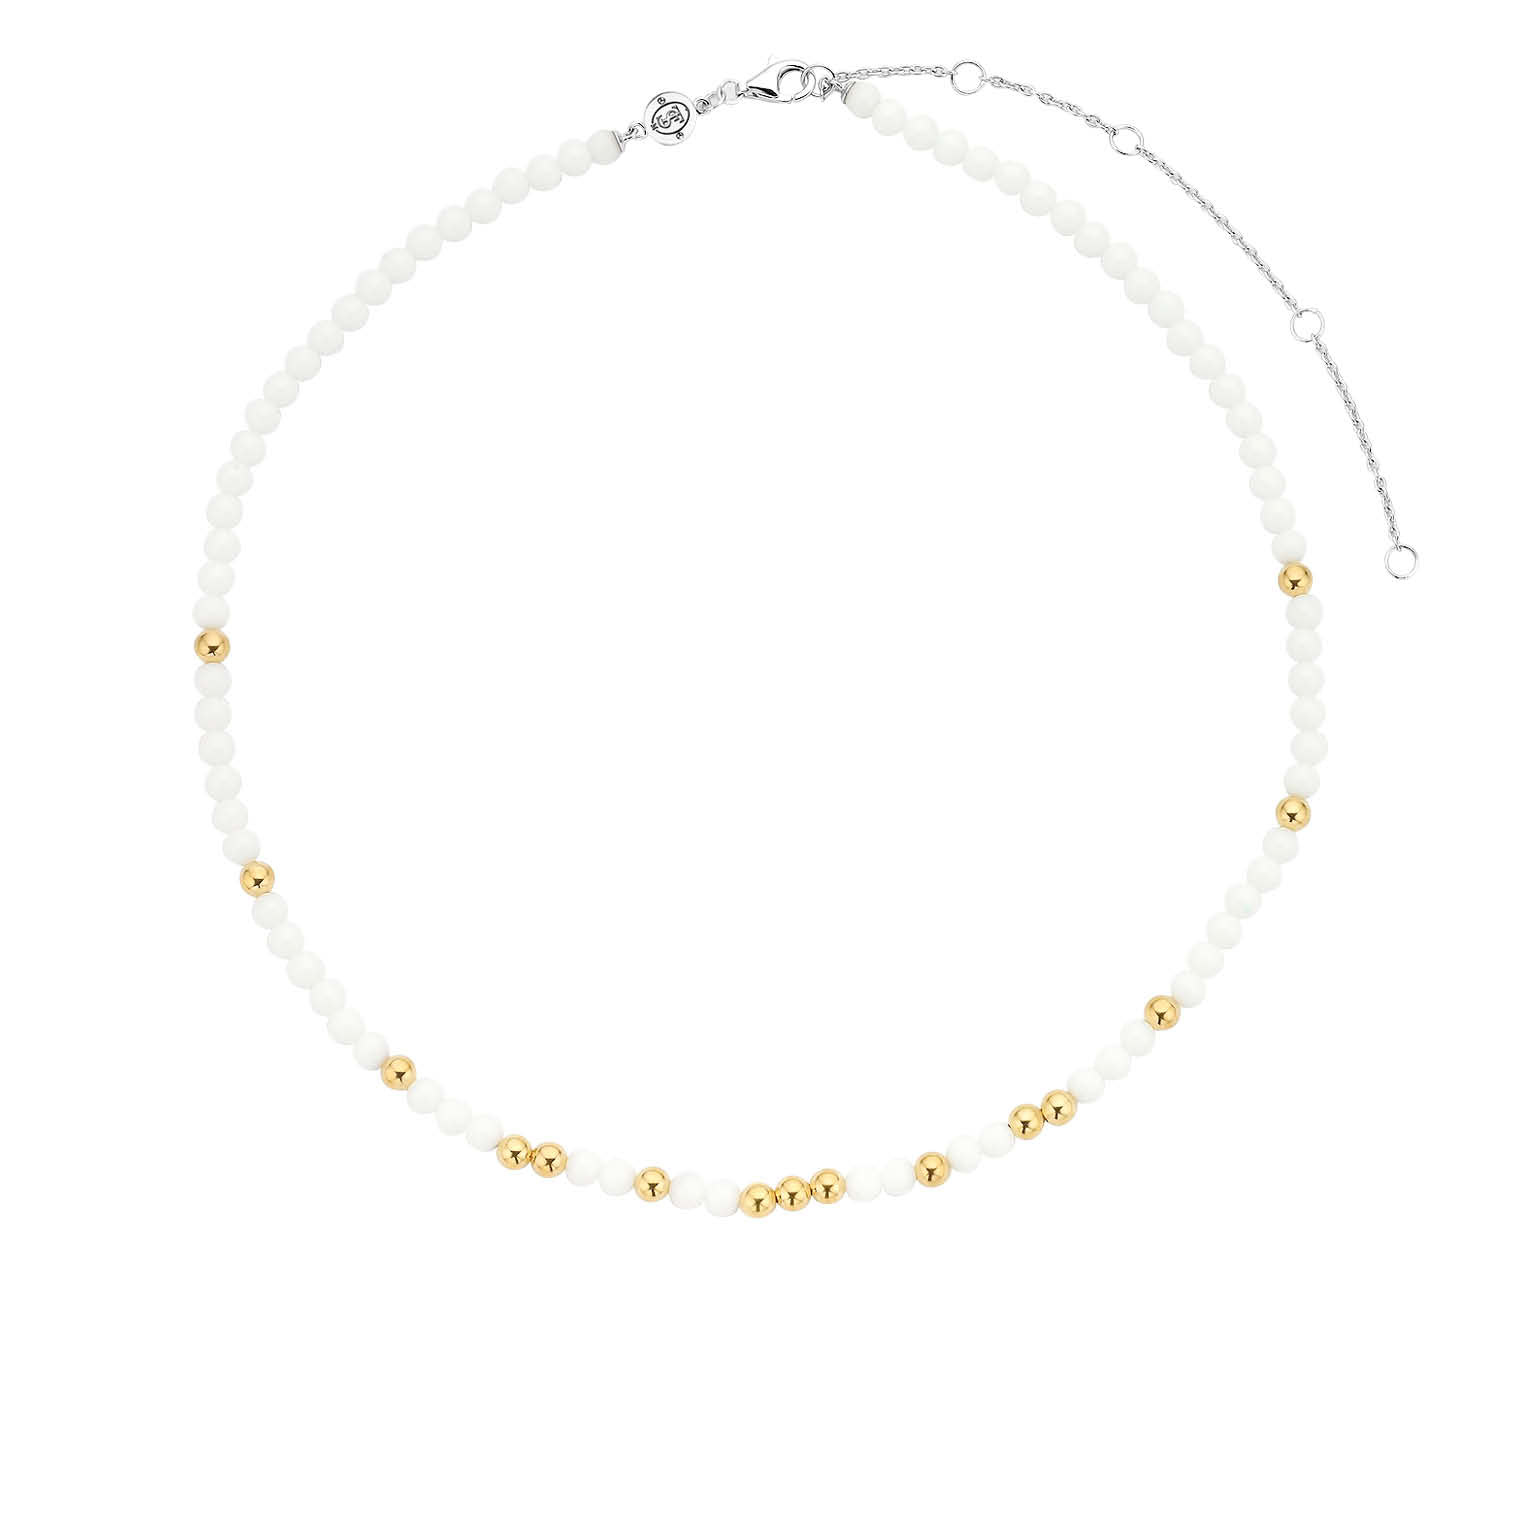 TI SENTO - Milano Necklace 3916WY-4